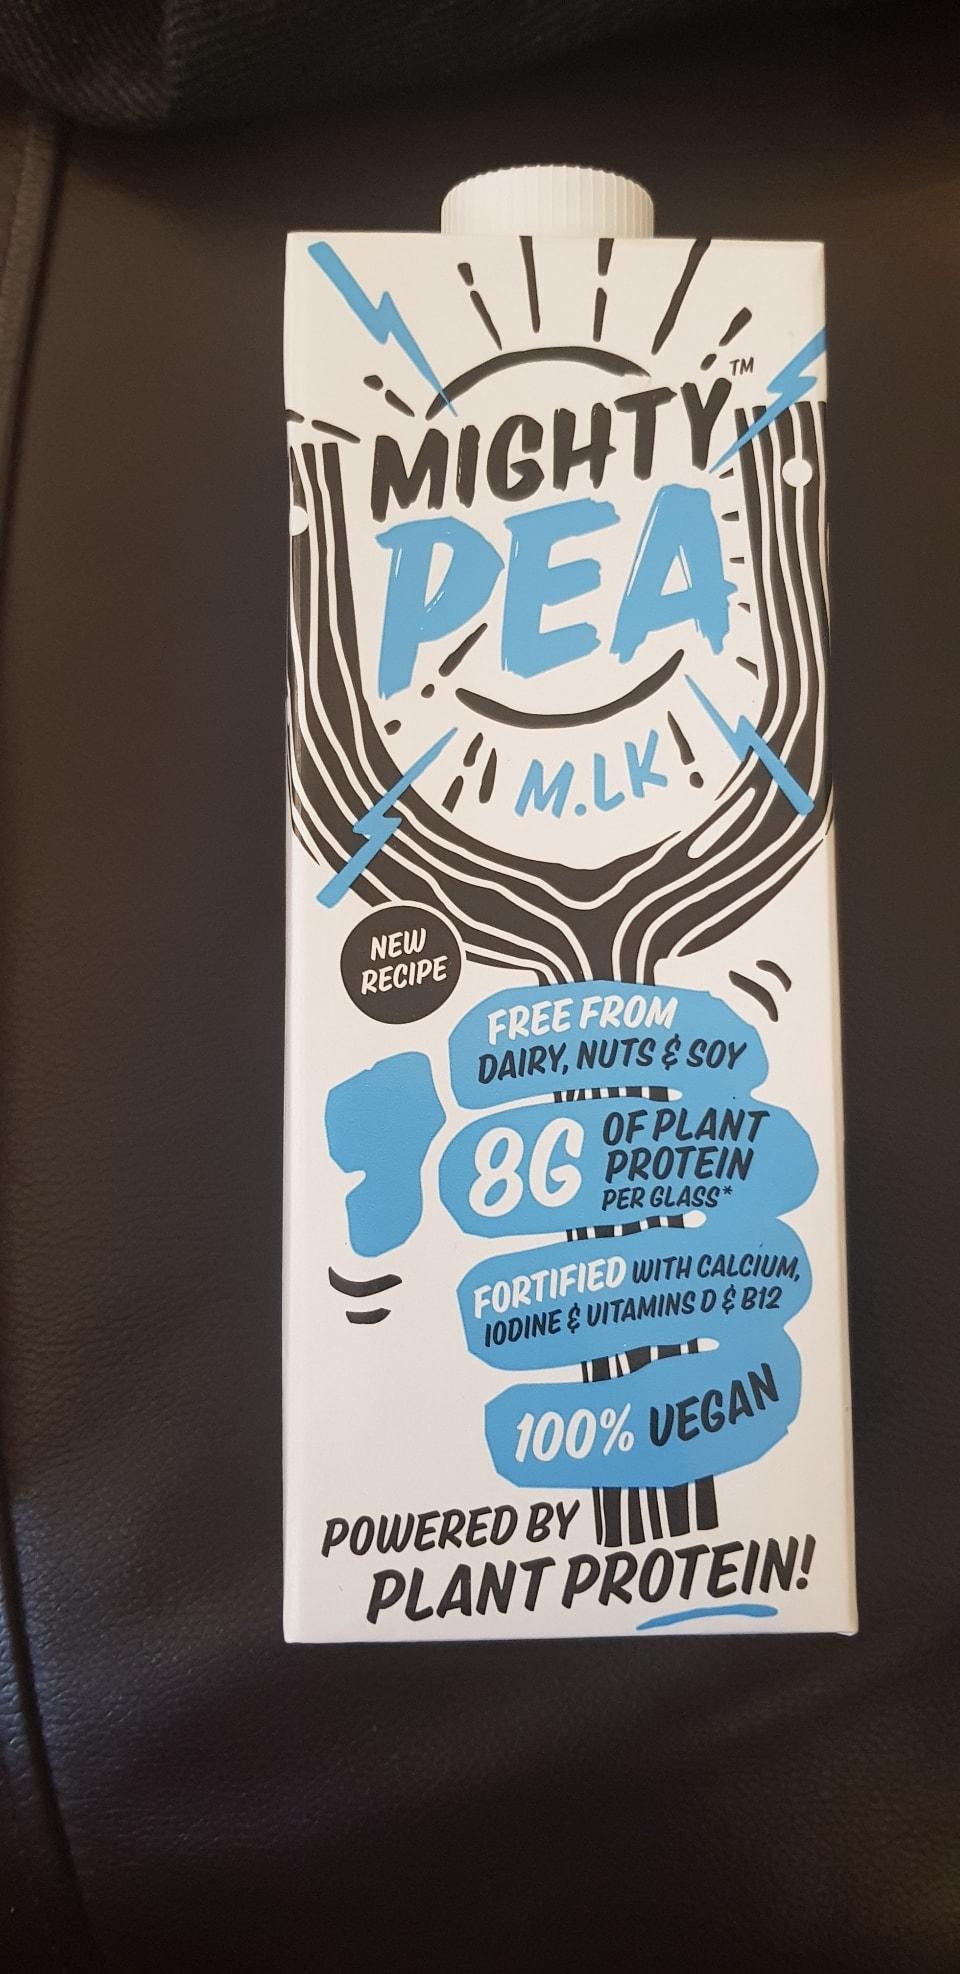 Mighty pea milk original free from dairy soy nut  . Vegan